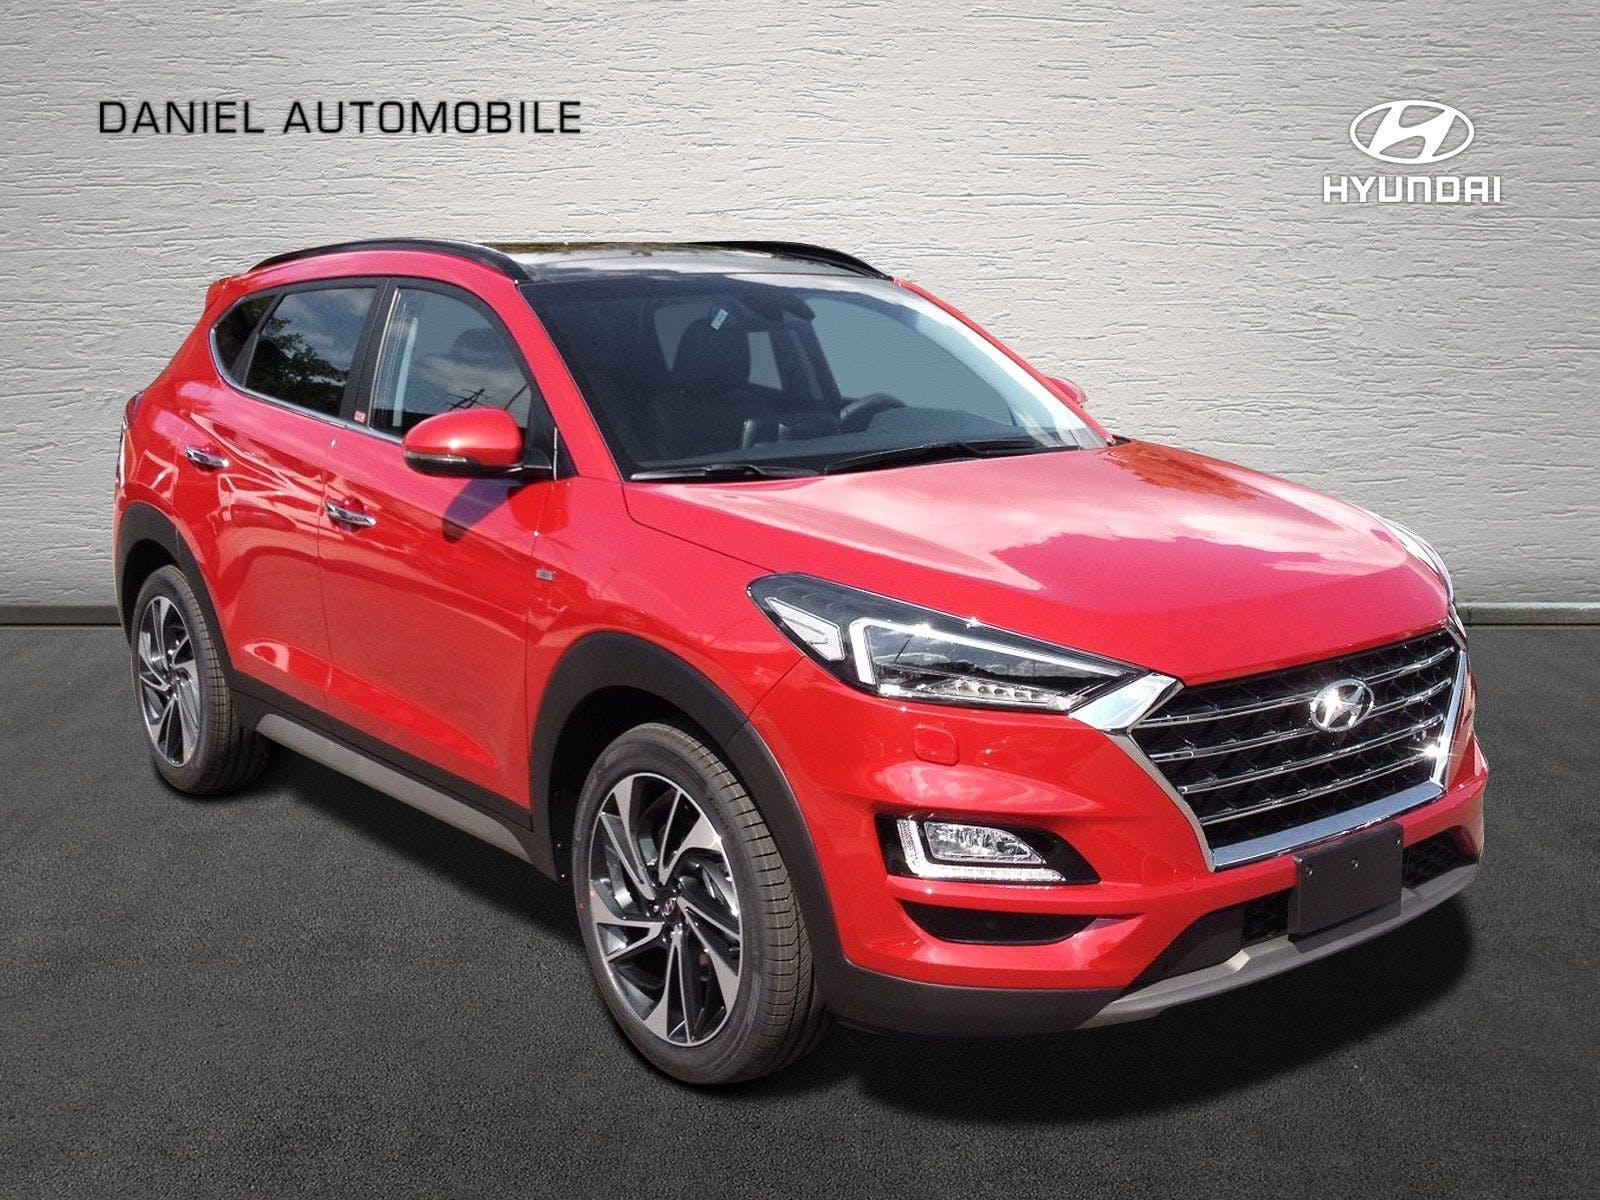 suv Hyundai Tucson 2.0 CRDi 185 Vertex 4WD